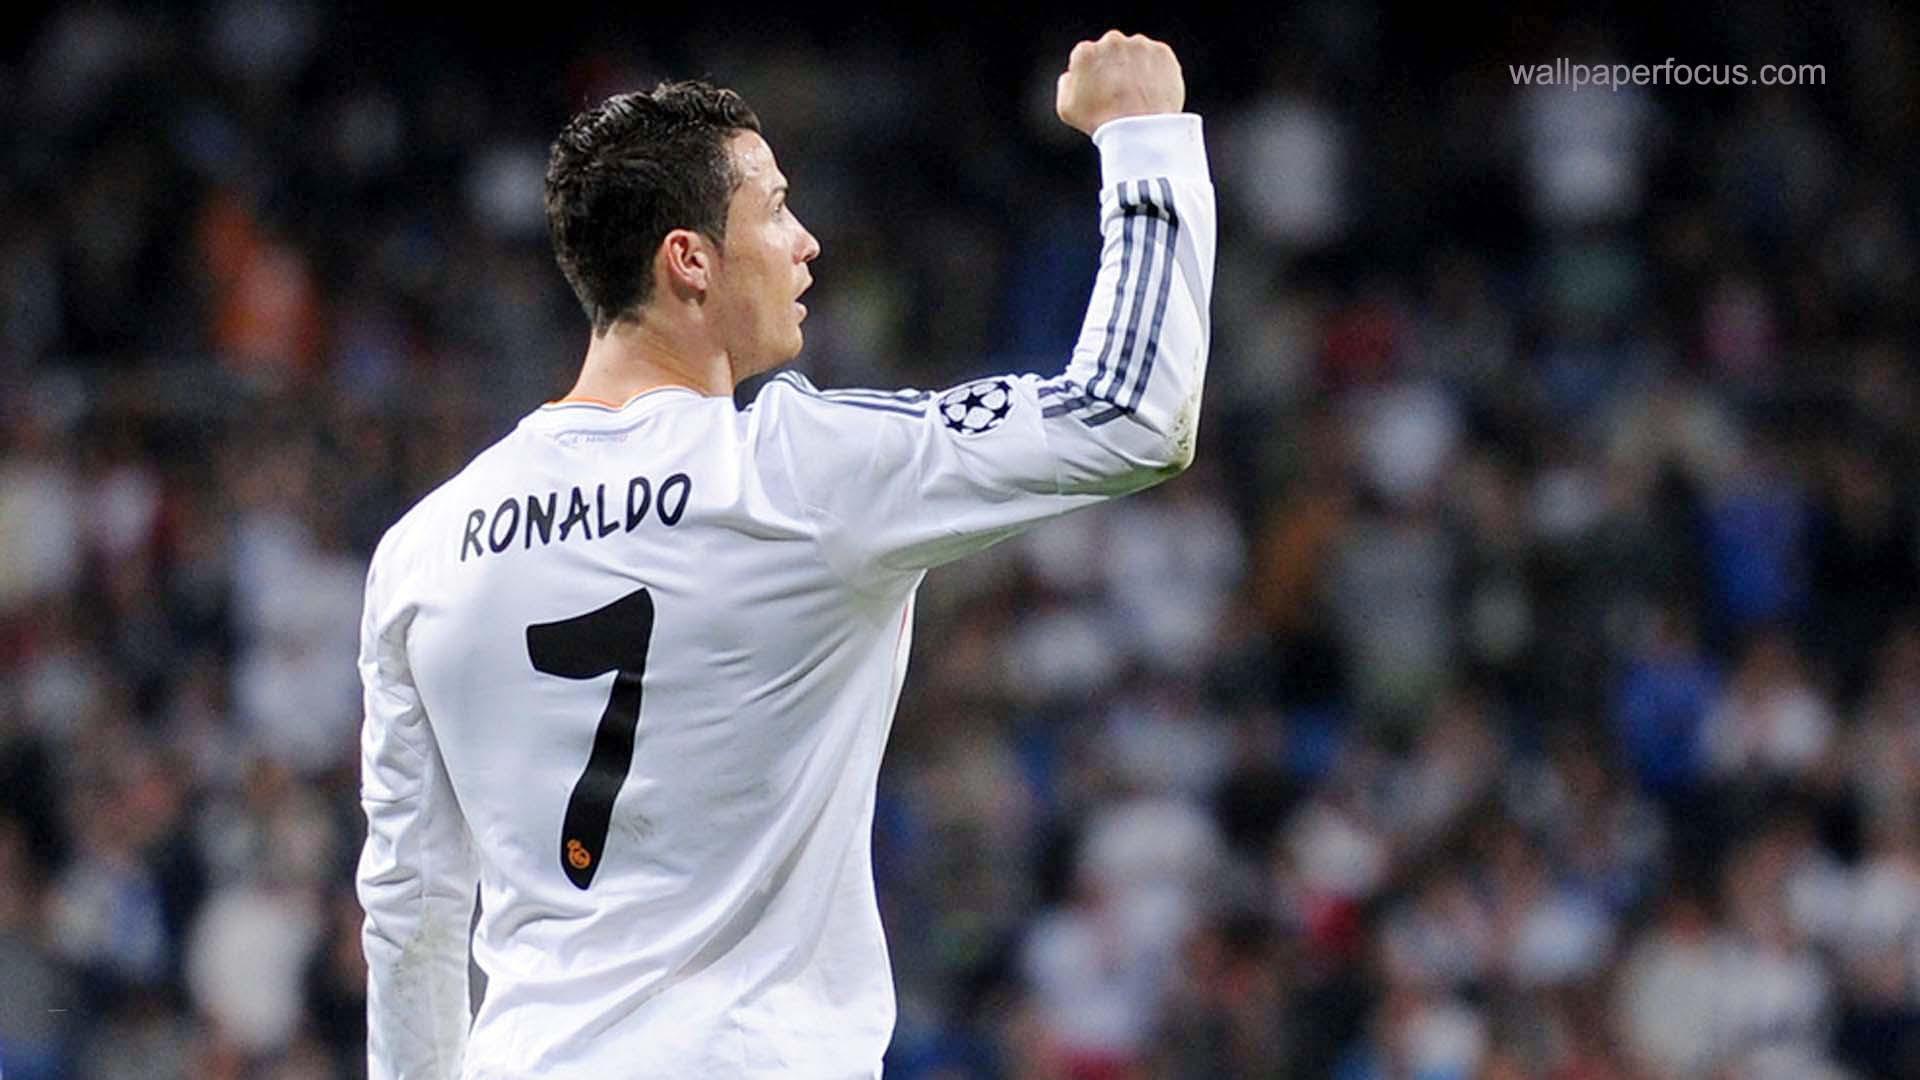 Cristiano Ronaldo Real Madrid Wallpaper Pixelstalk Intense